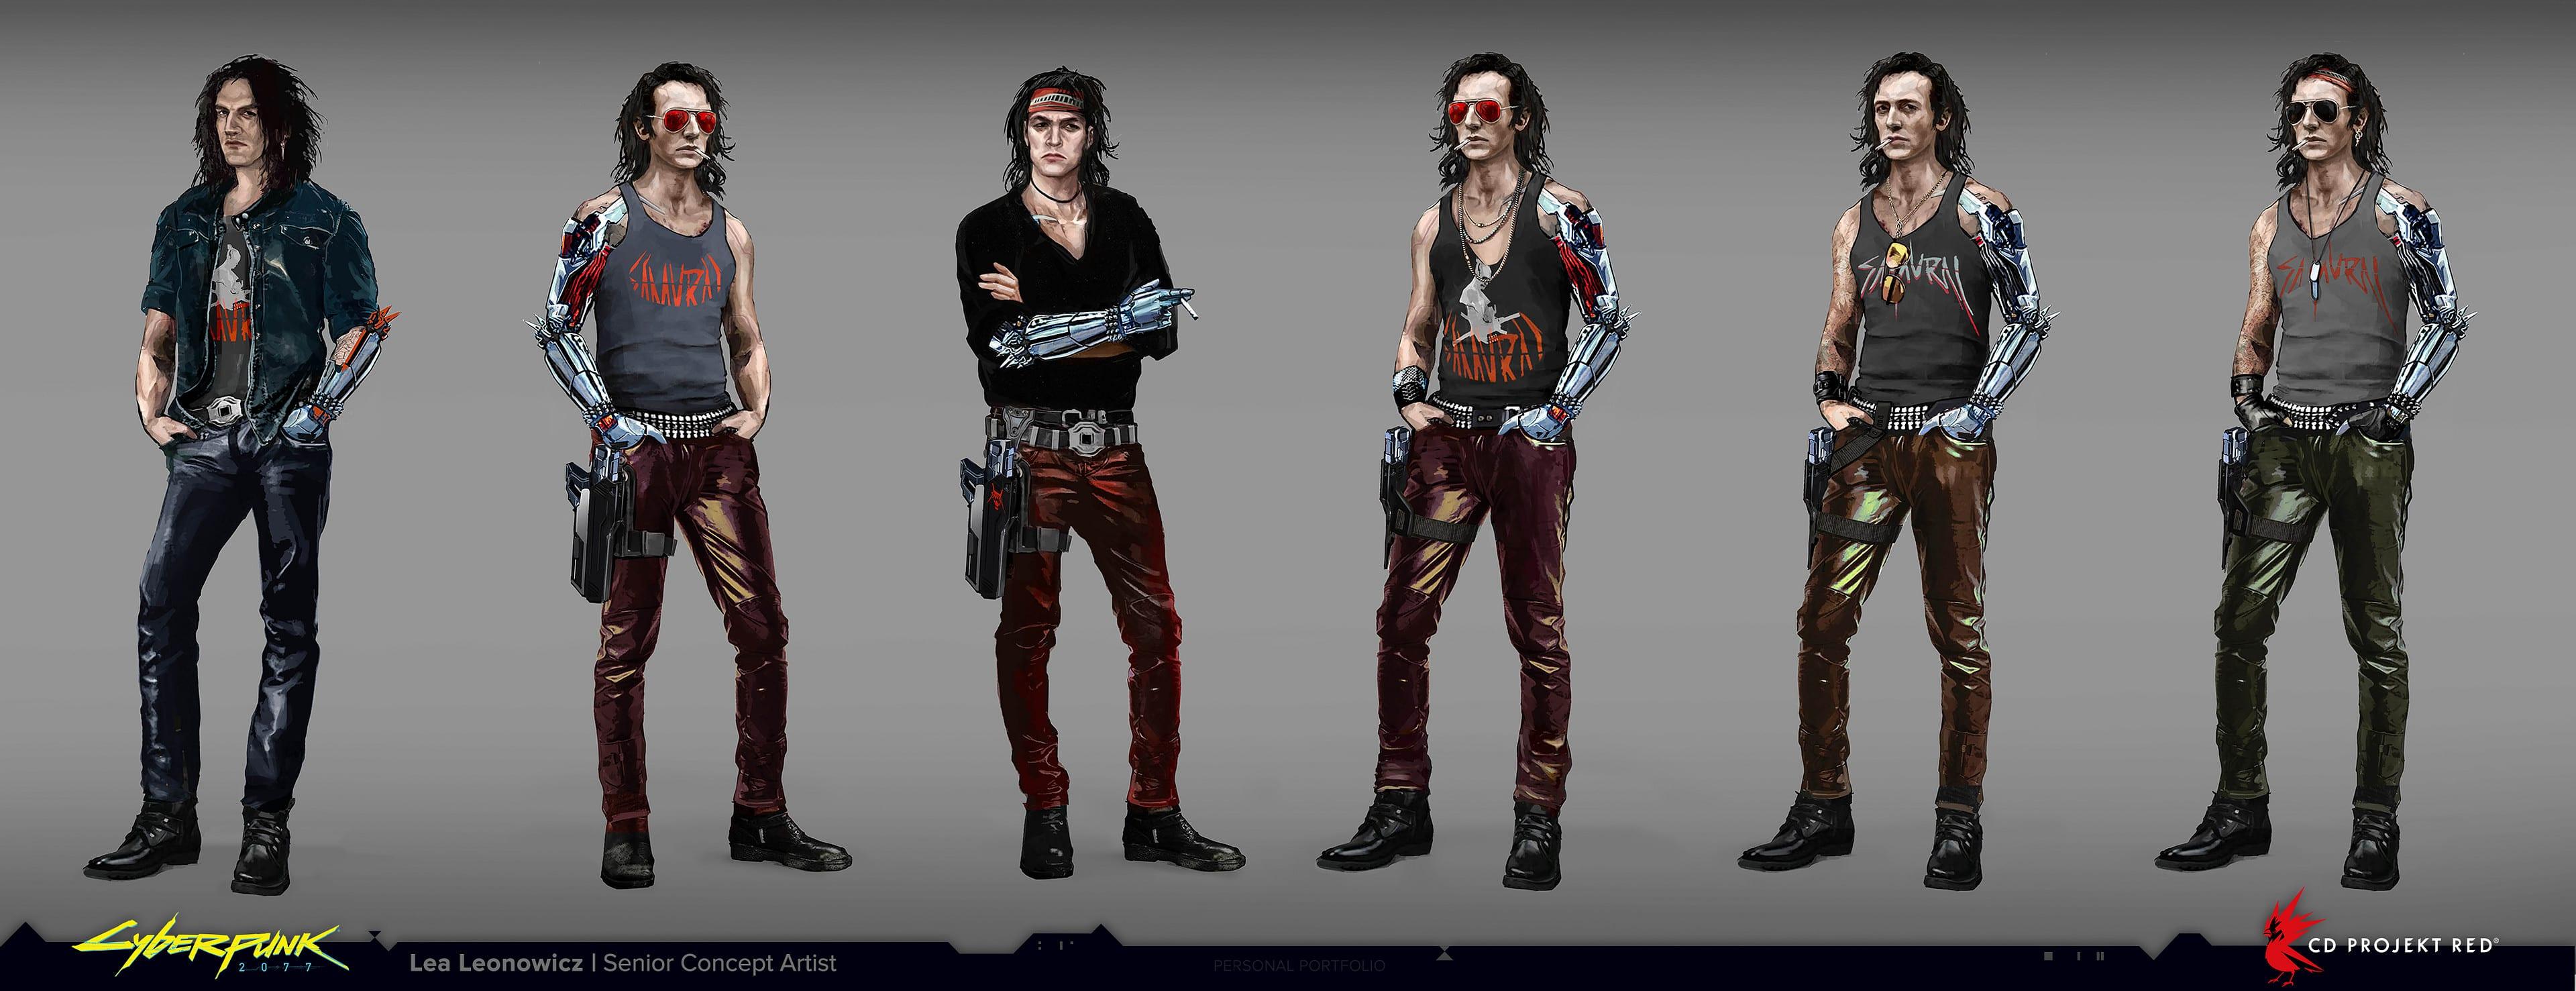 Cyberpunk 2077 Concept Johnny Silverhand